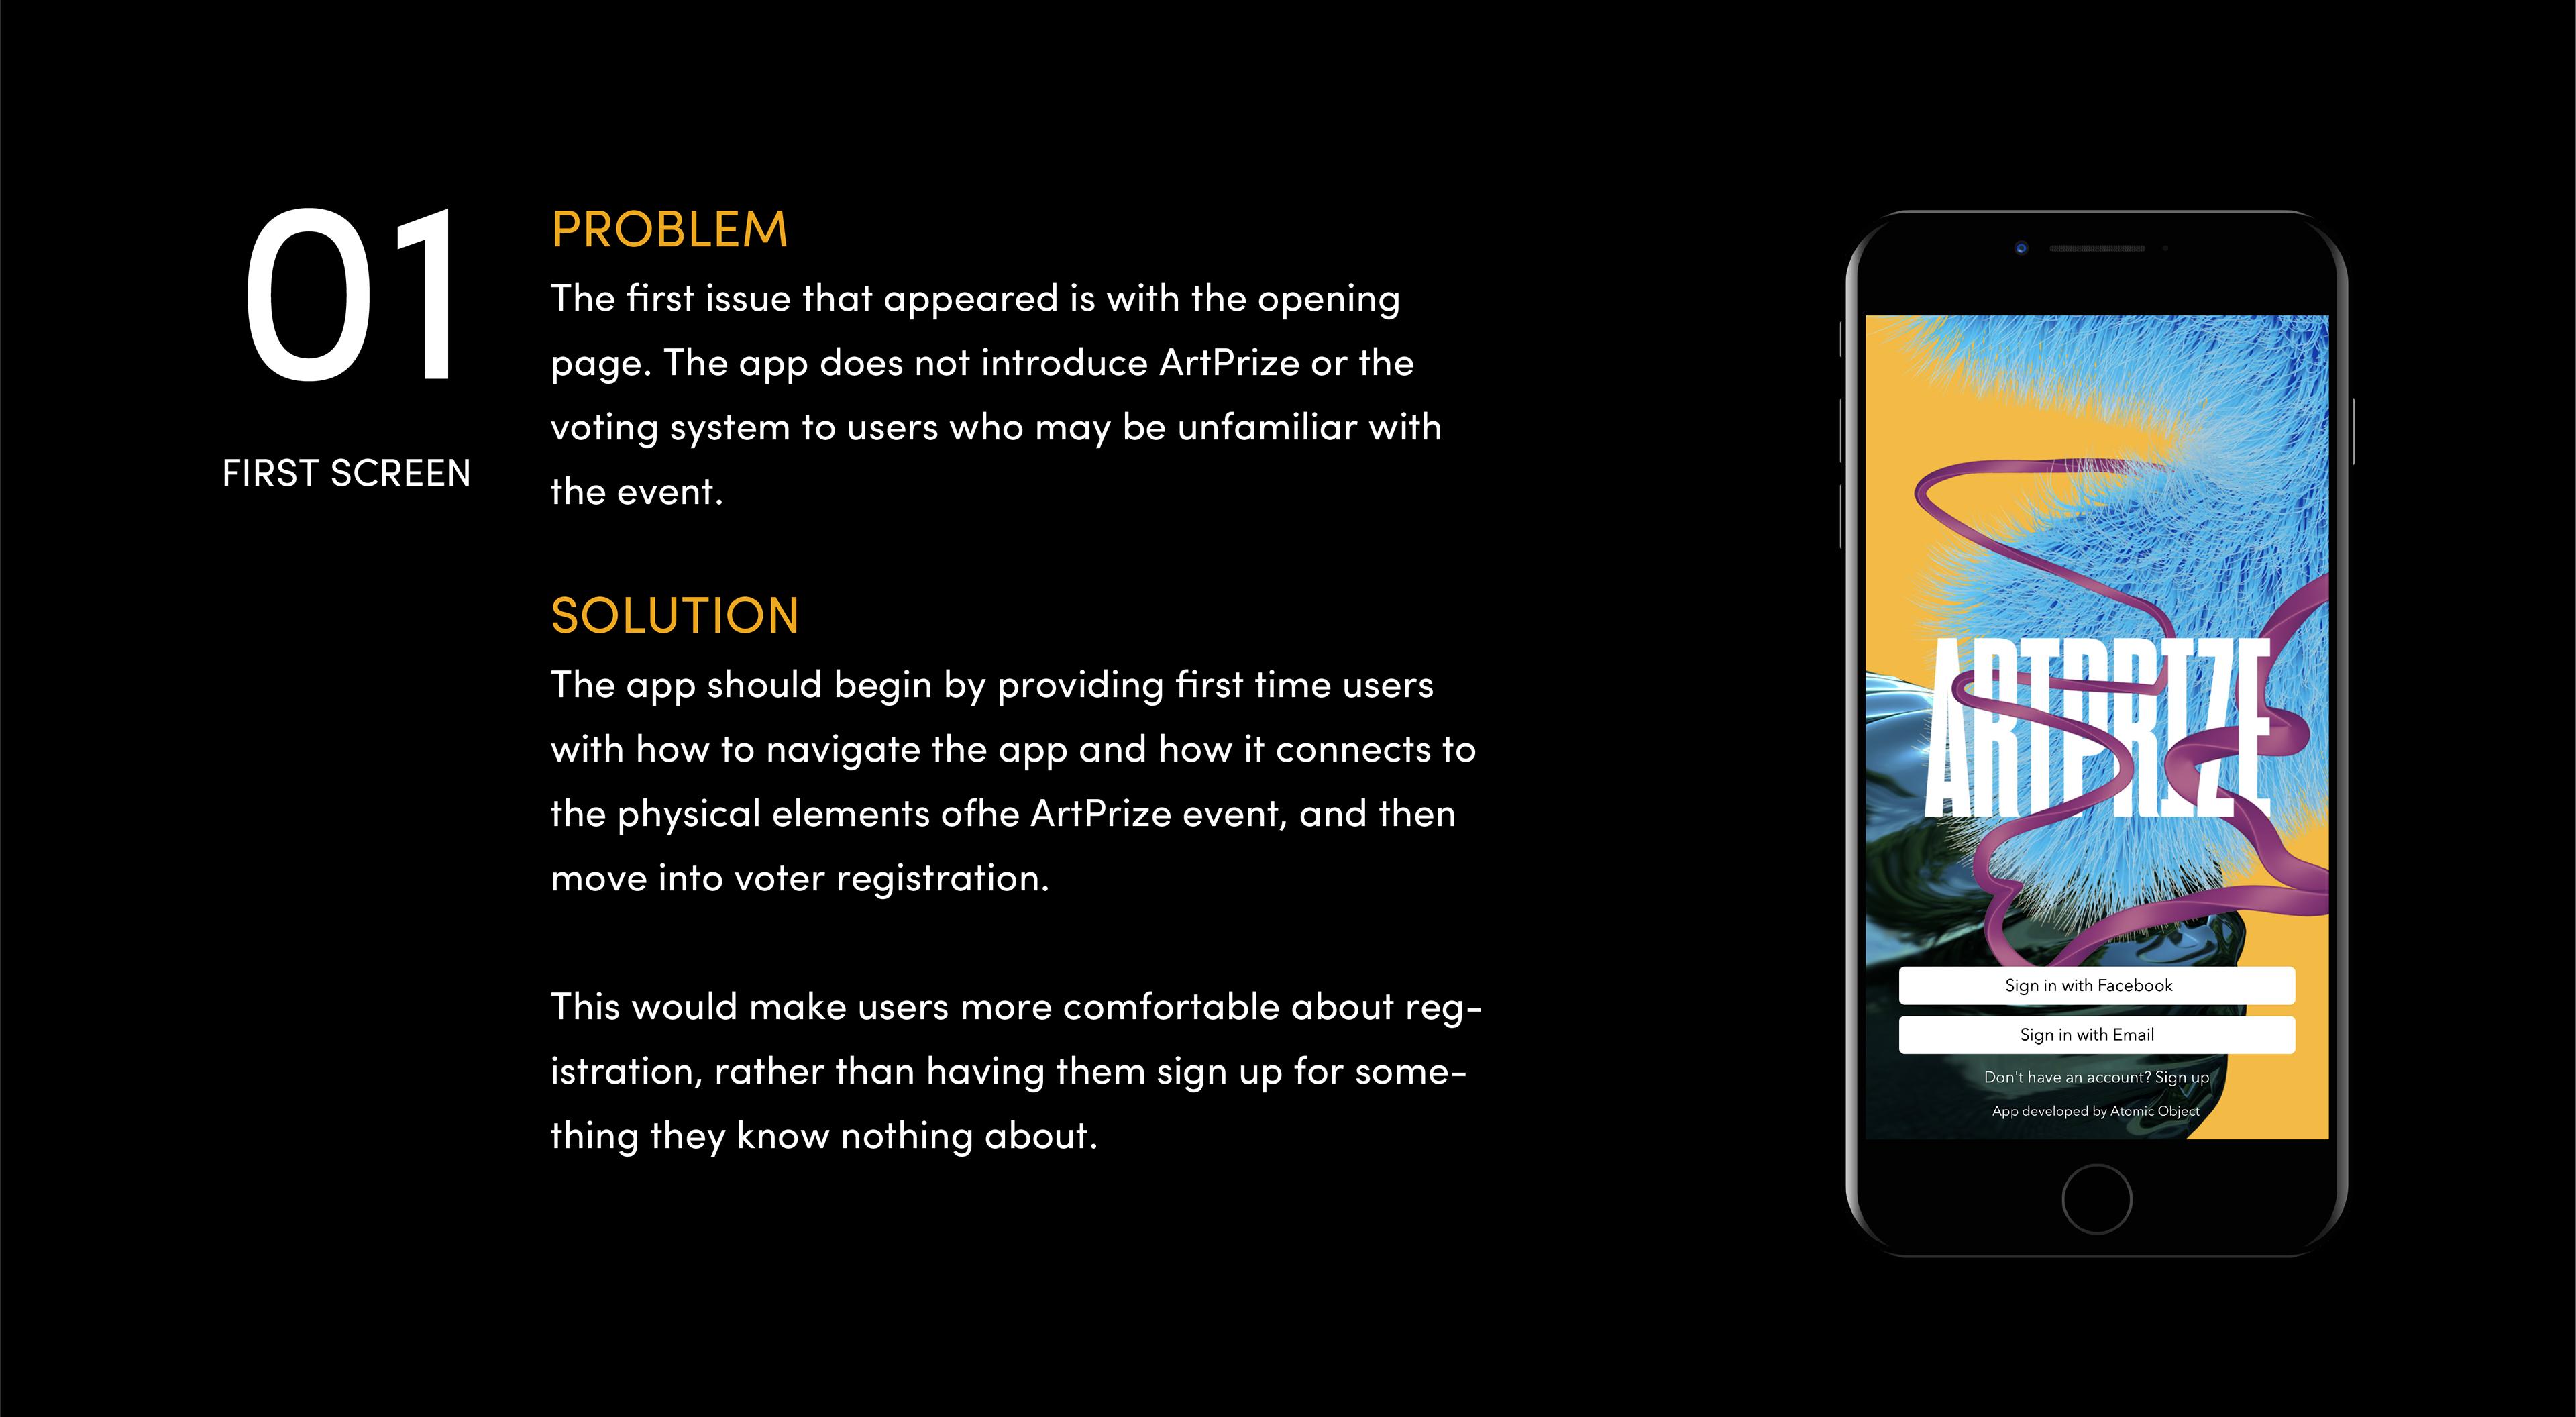 Last Exit Studios - Heuristic Evaluation: ArtPrize Mobile App